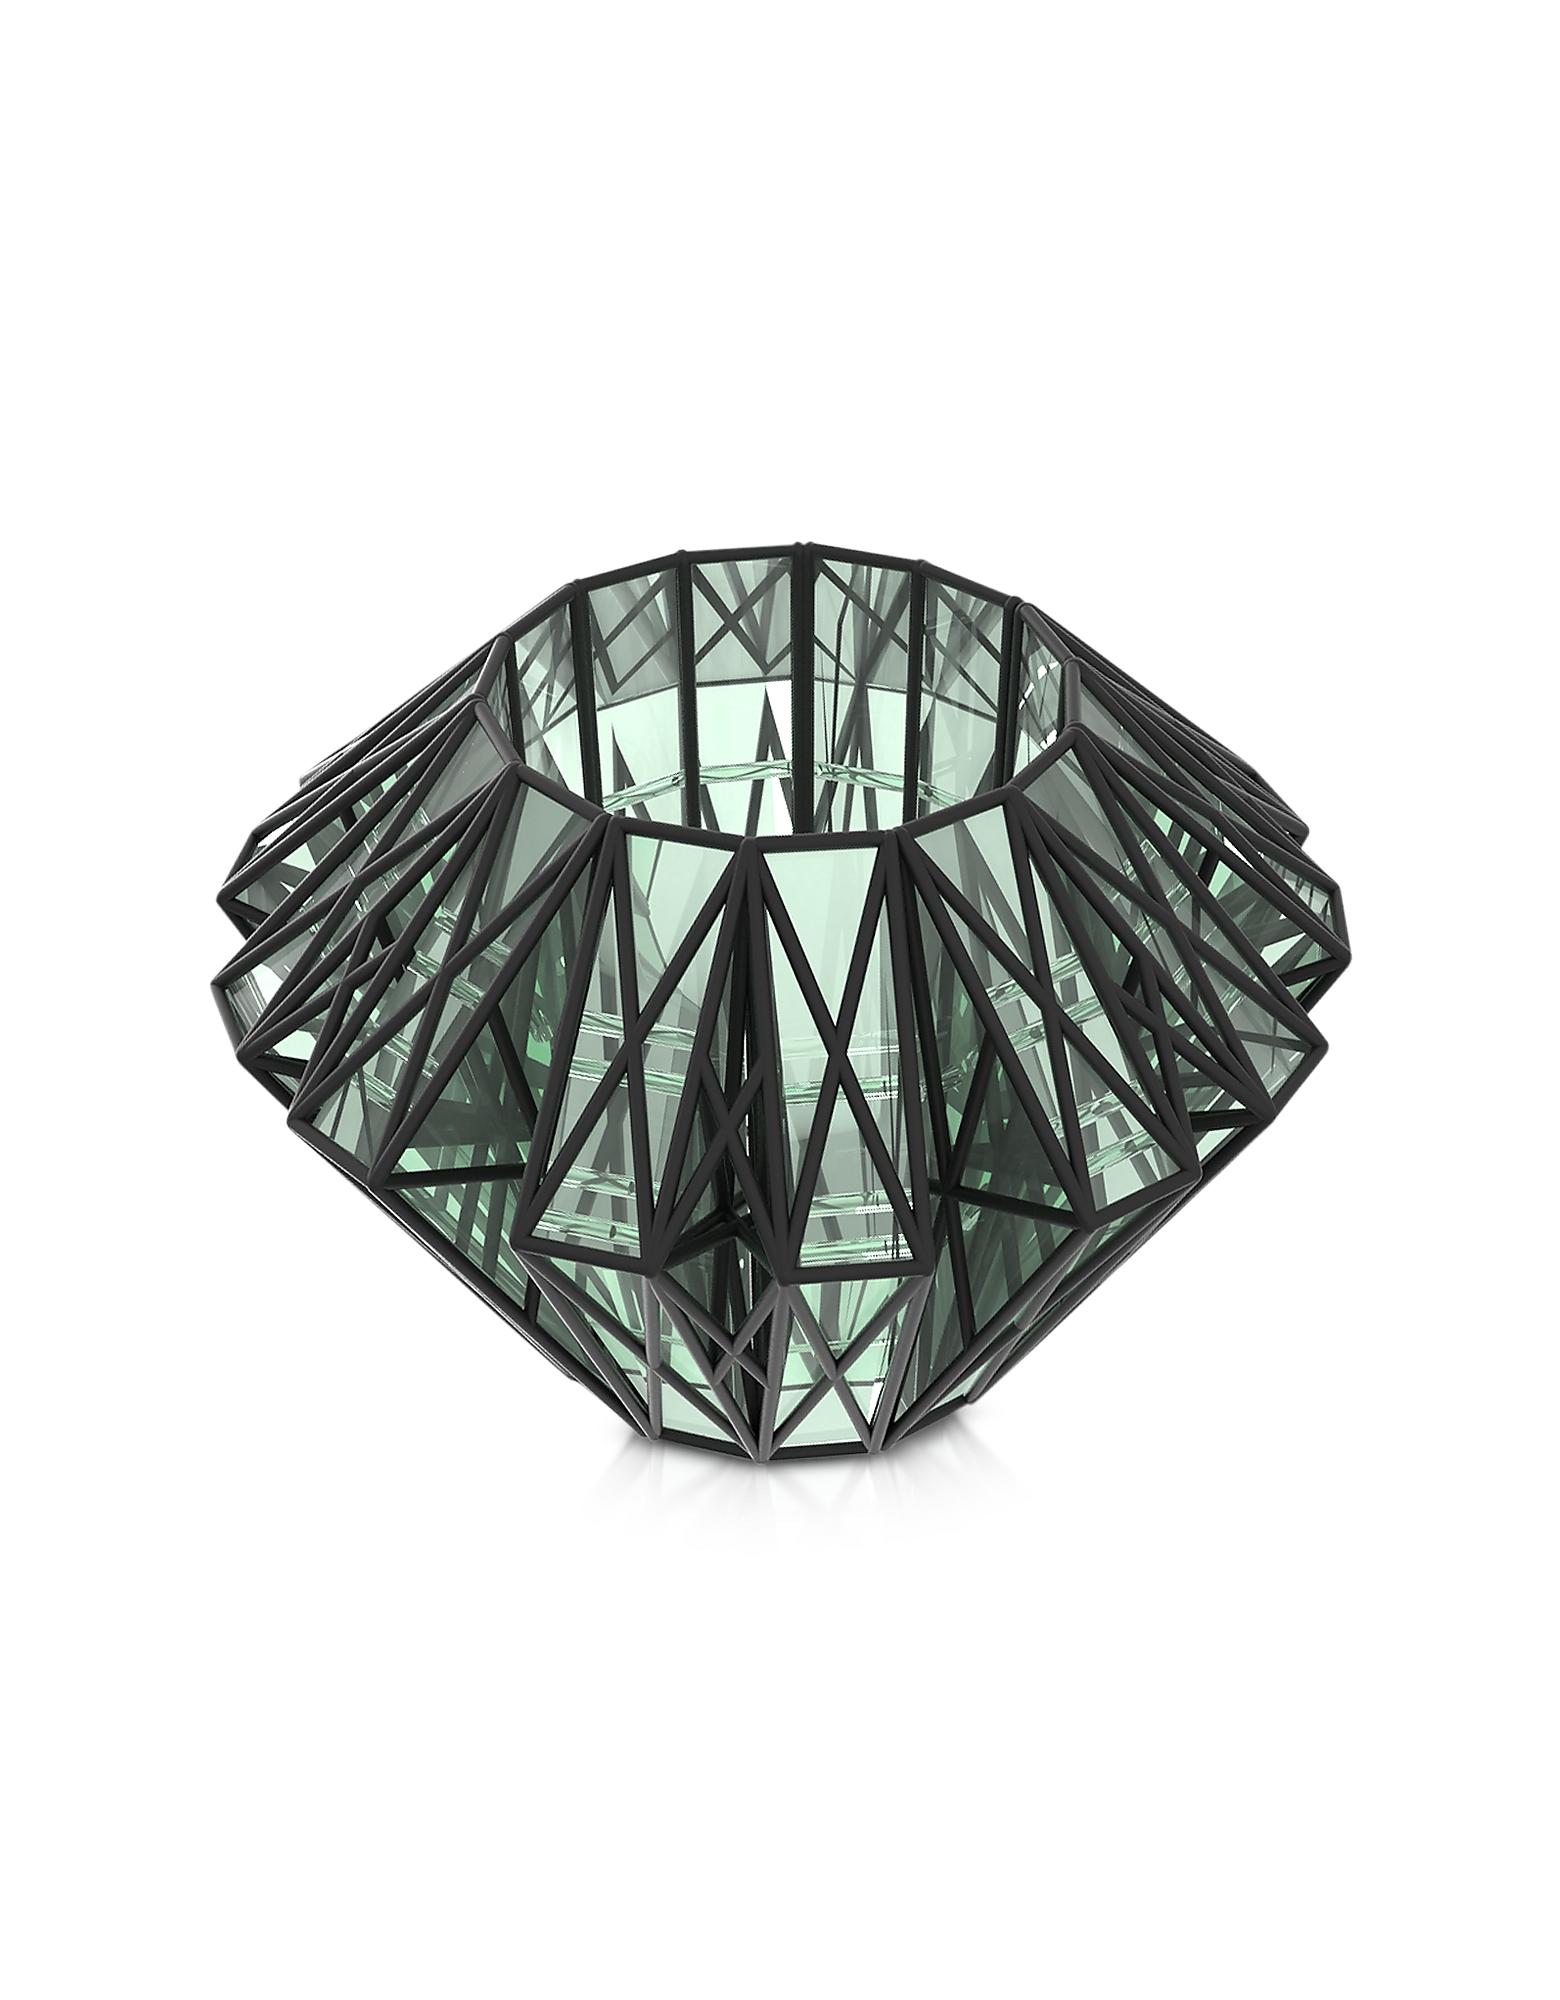 Translucent Glass Cage Statement Cuff